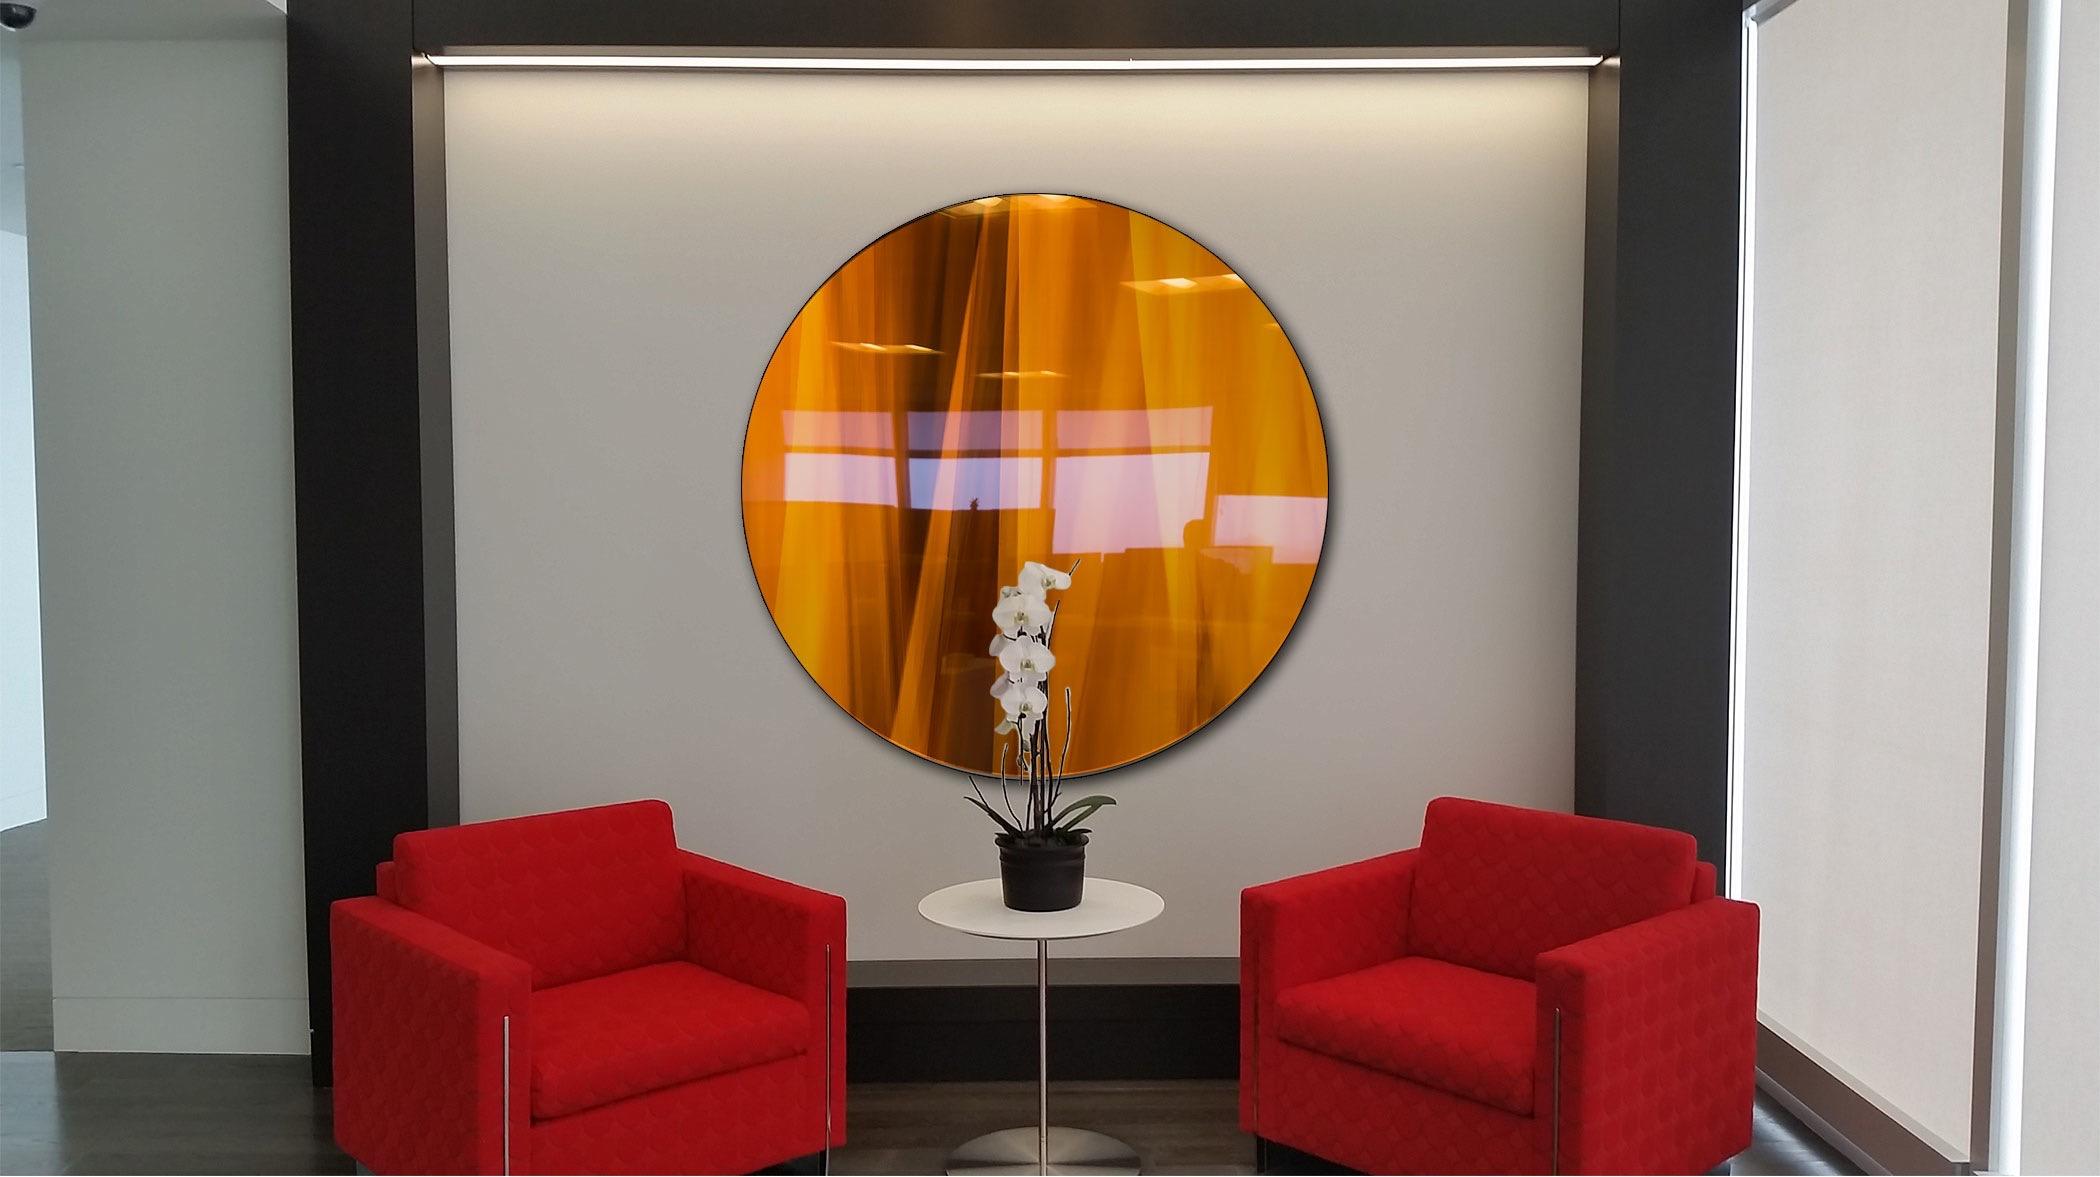 Dimensional Fund Advisors, Santa Monica CA